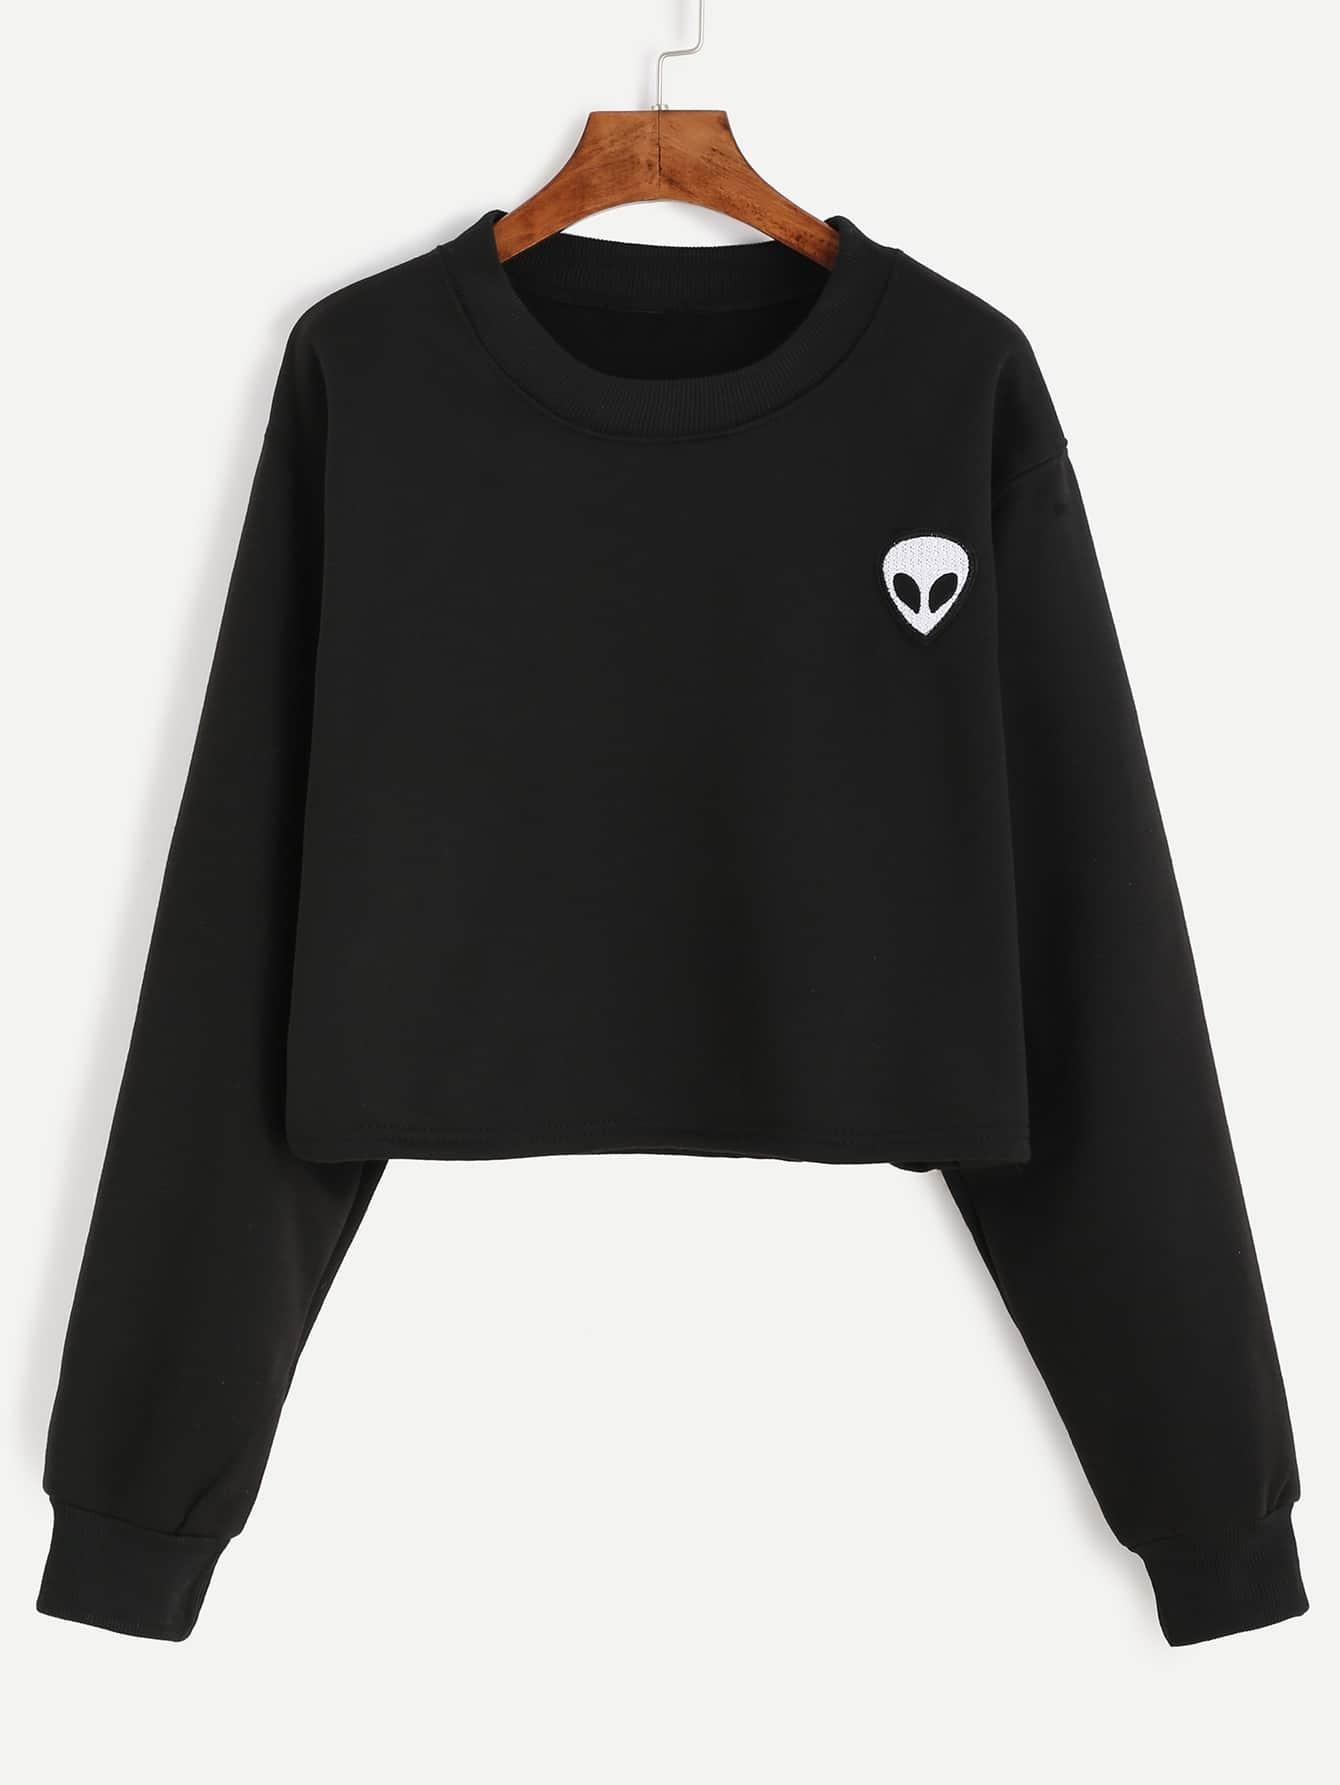 Alien Embroidered Crop Sweatshirt